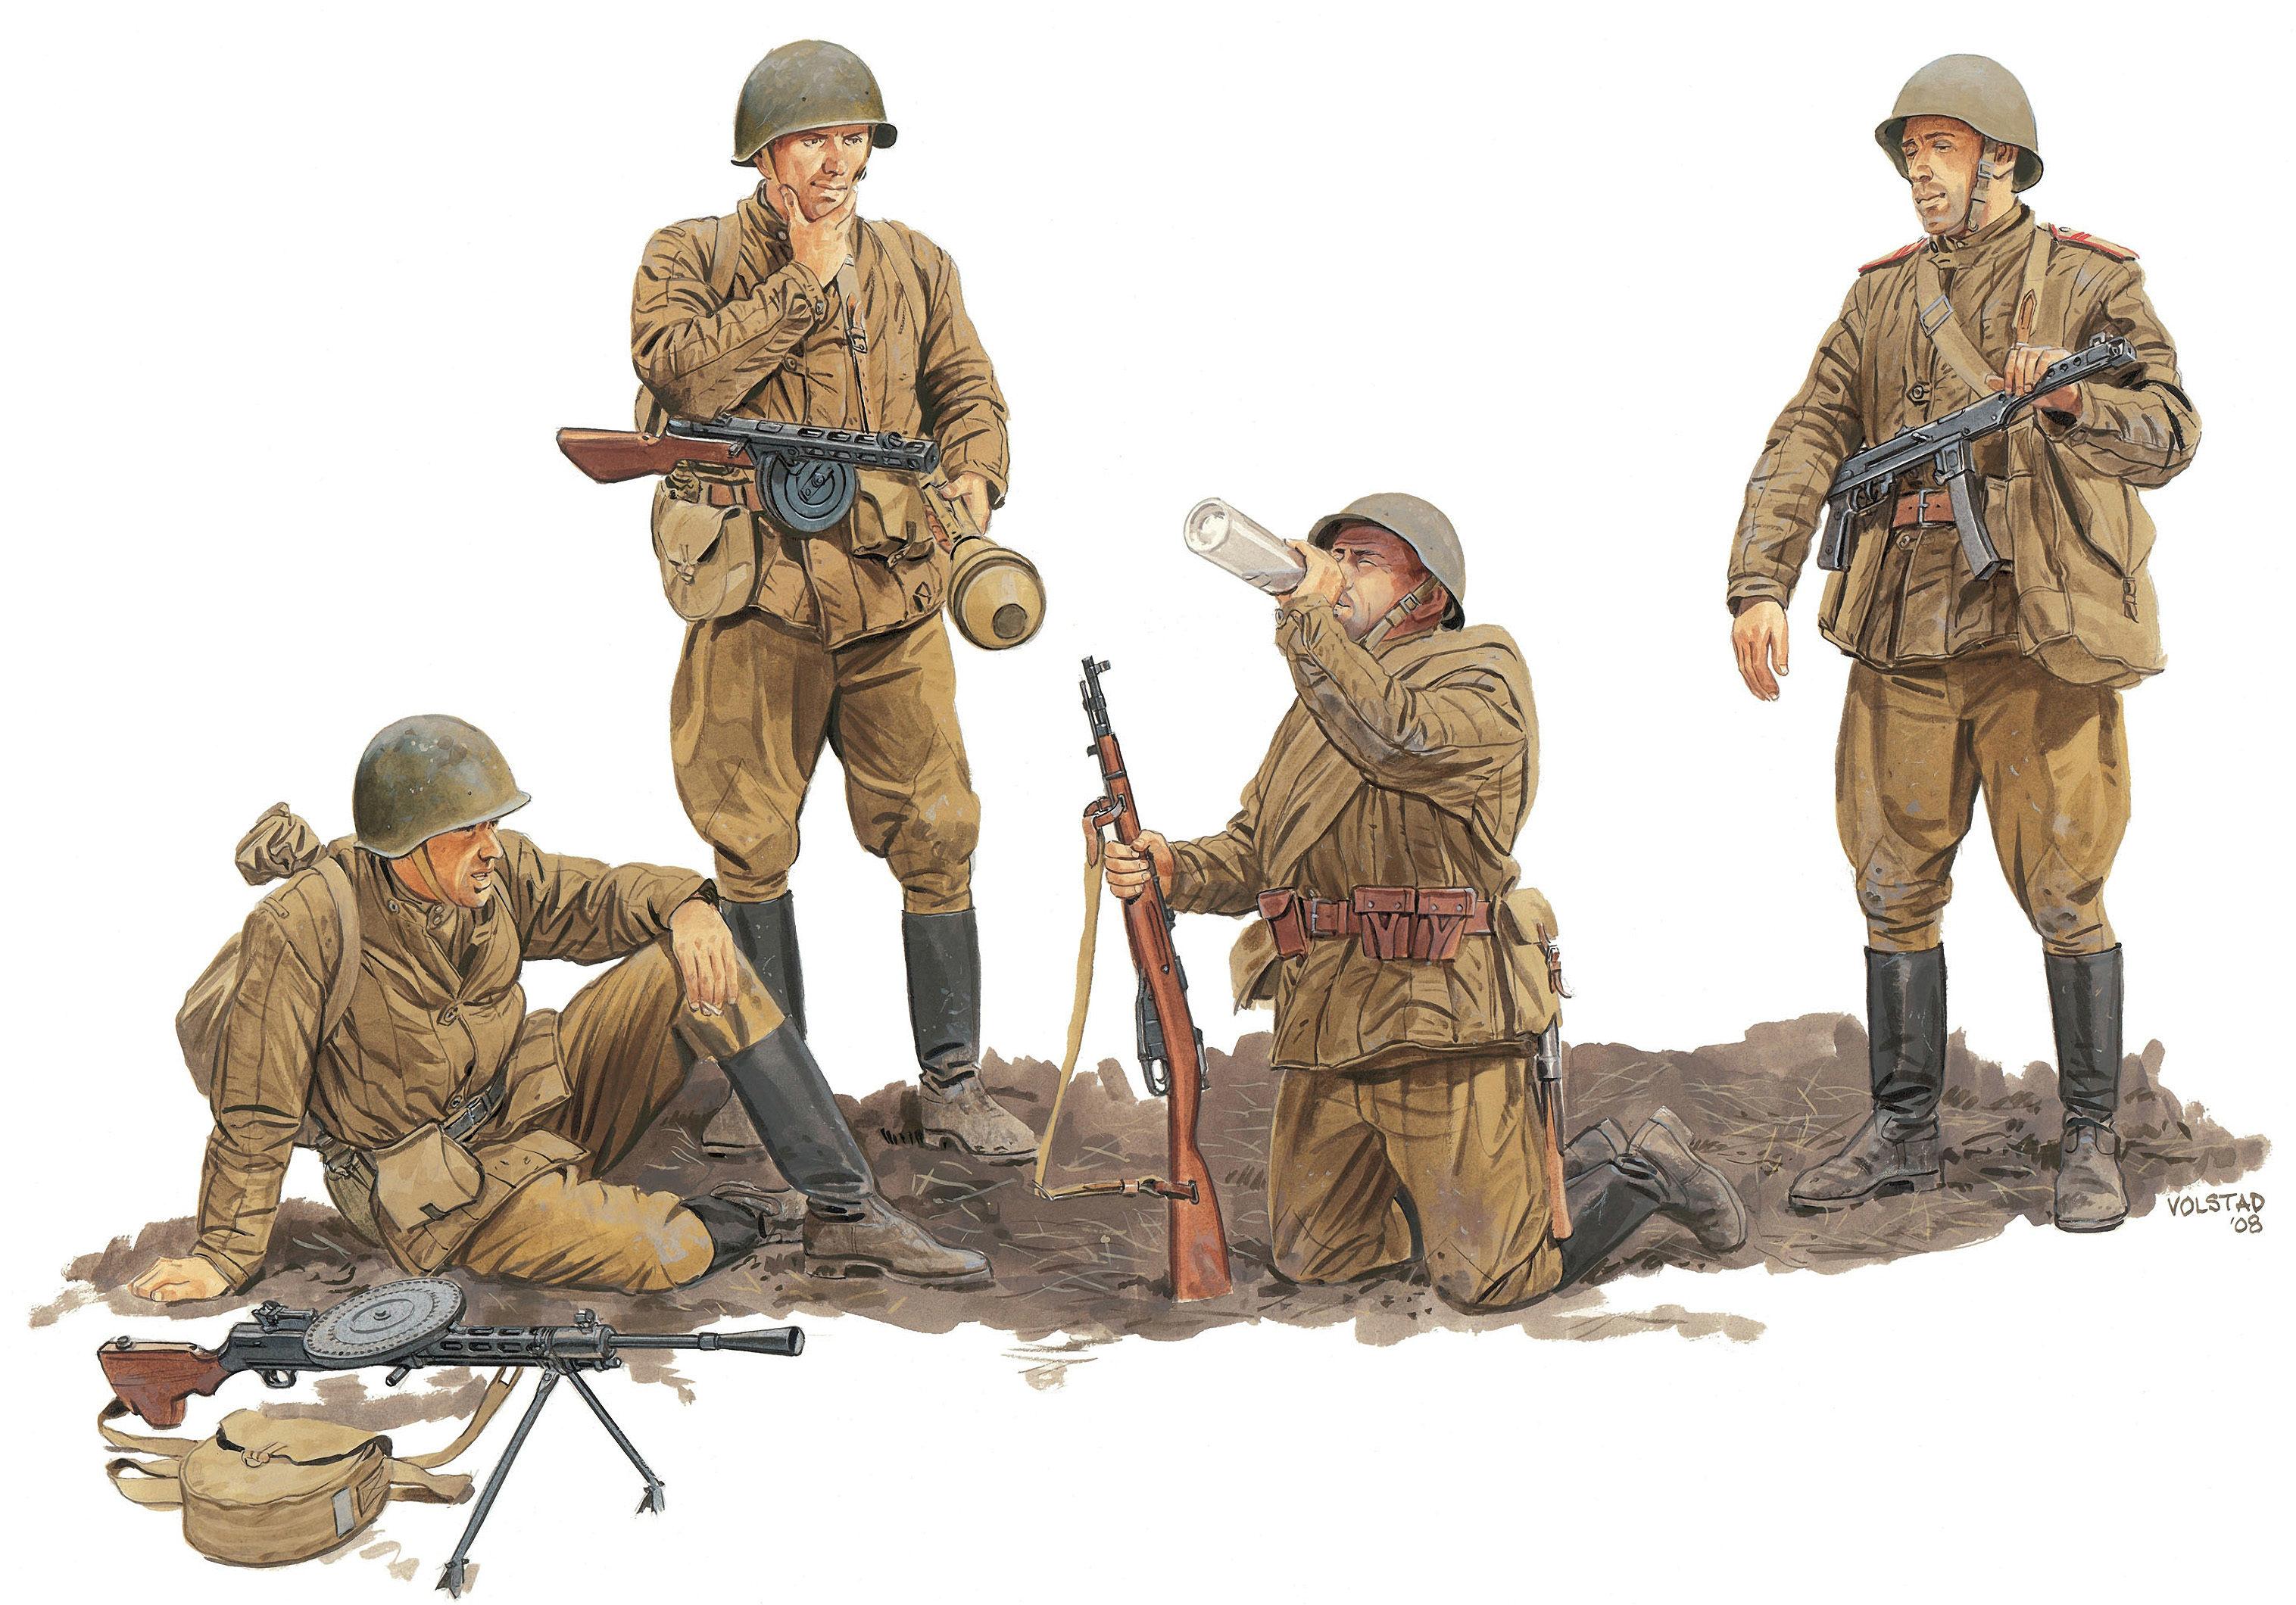 Volstad Ronald. Советская пехота.